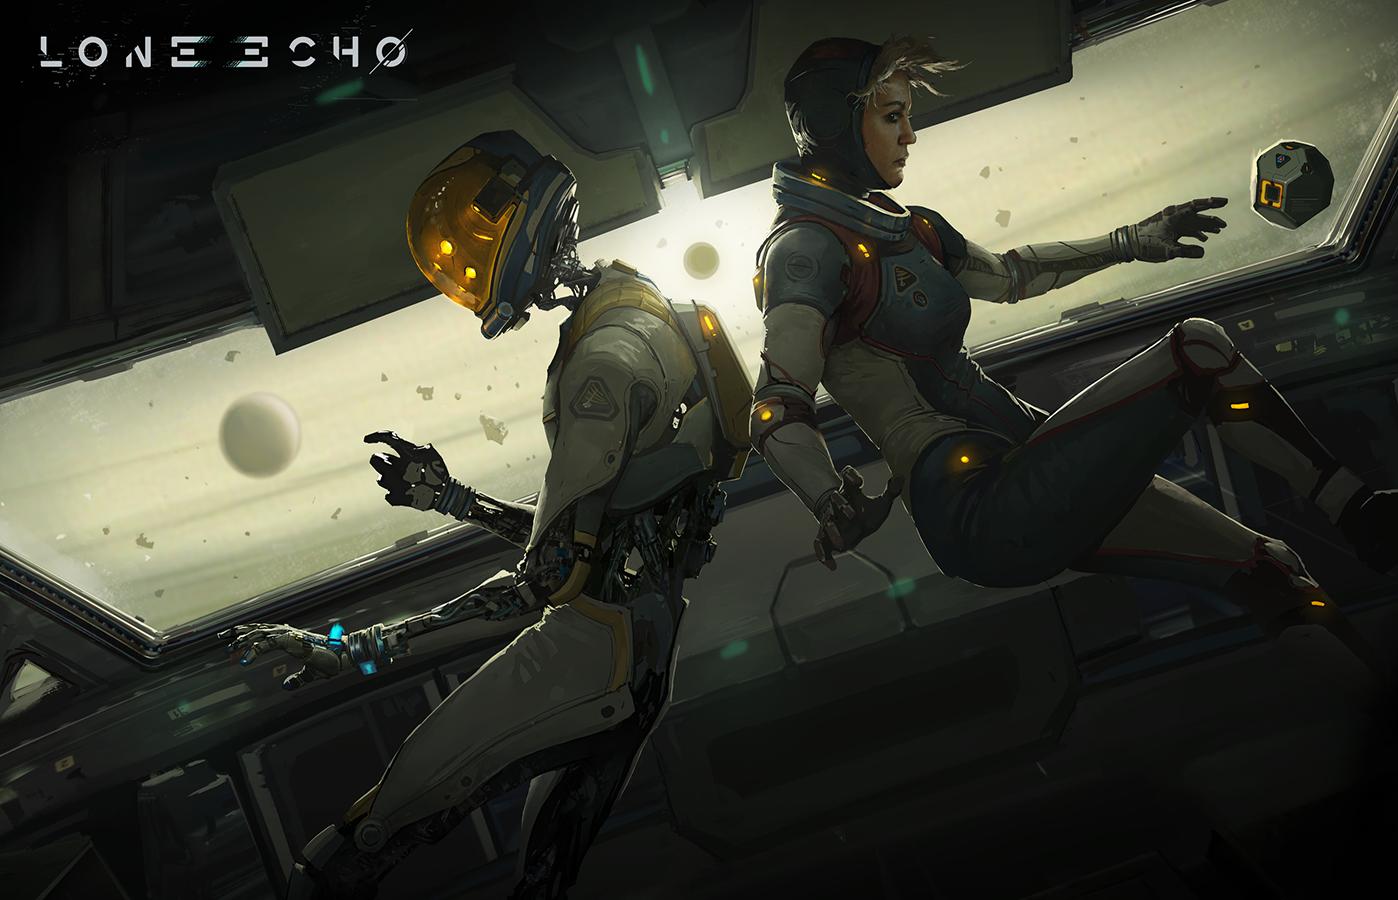 Lone_Echo_art1